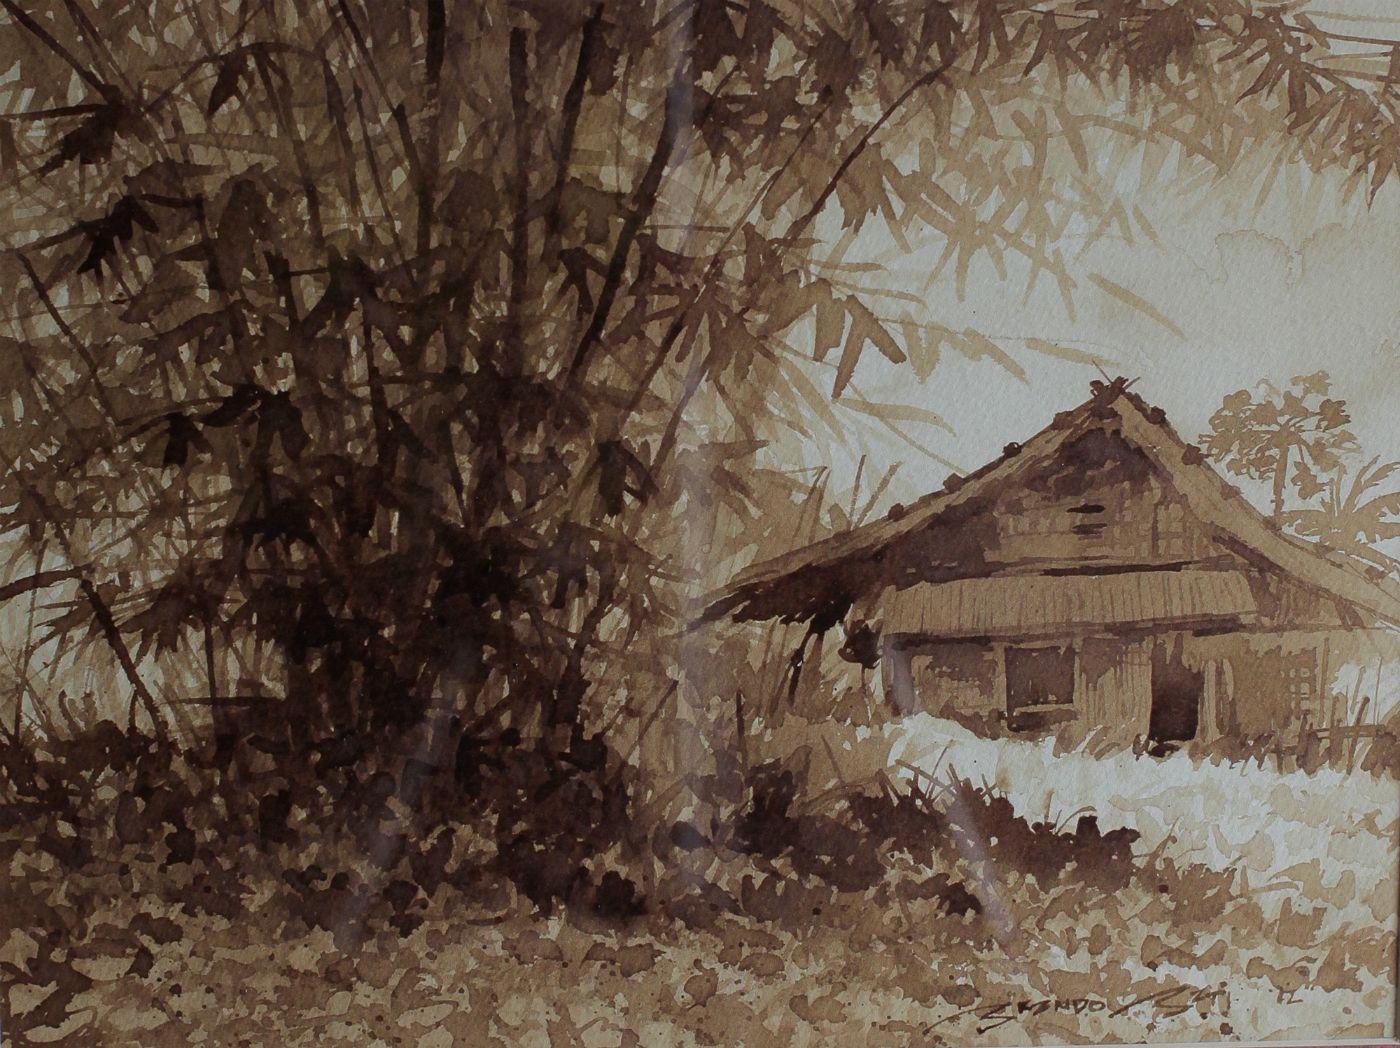 Brandon Bati Collection Filipino Visual Artist in Macuha